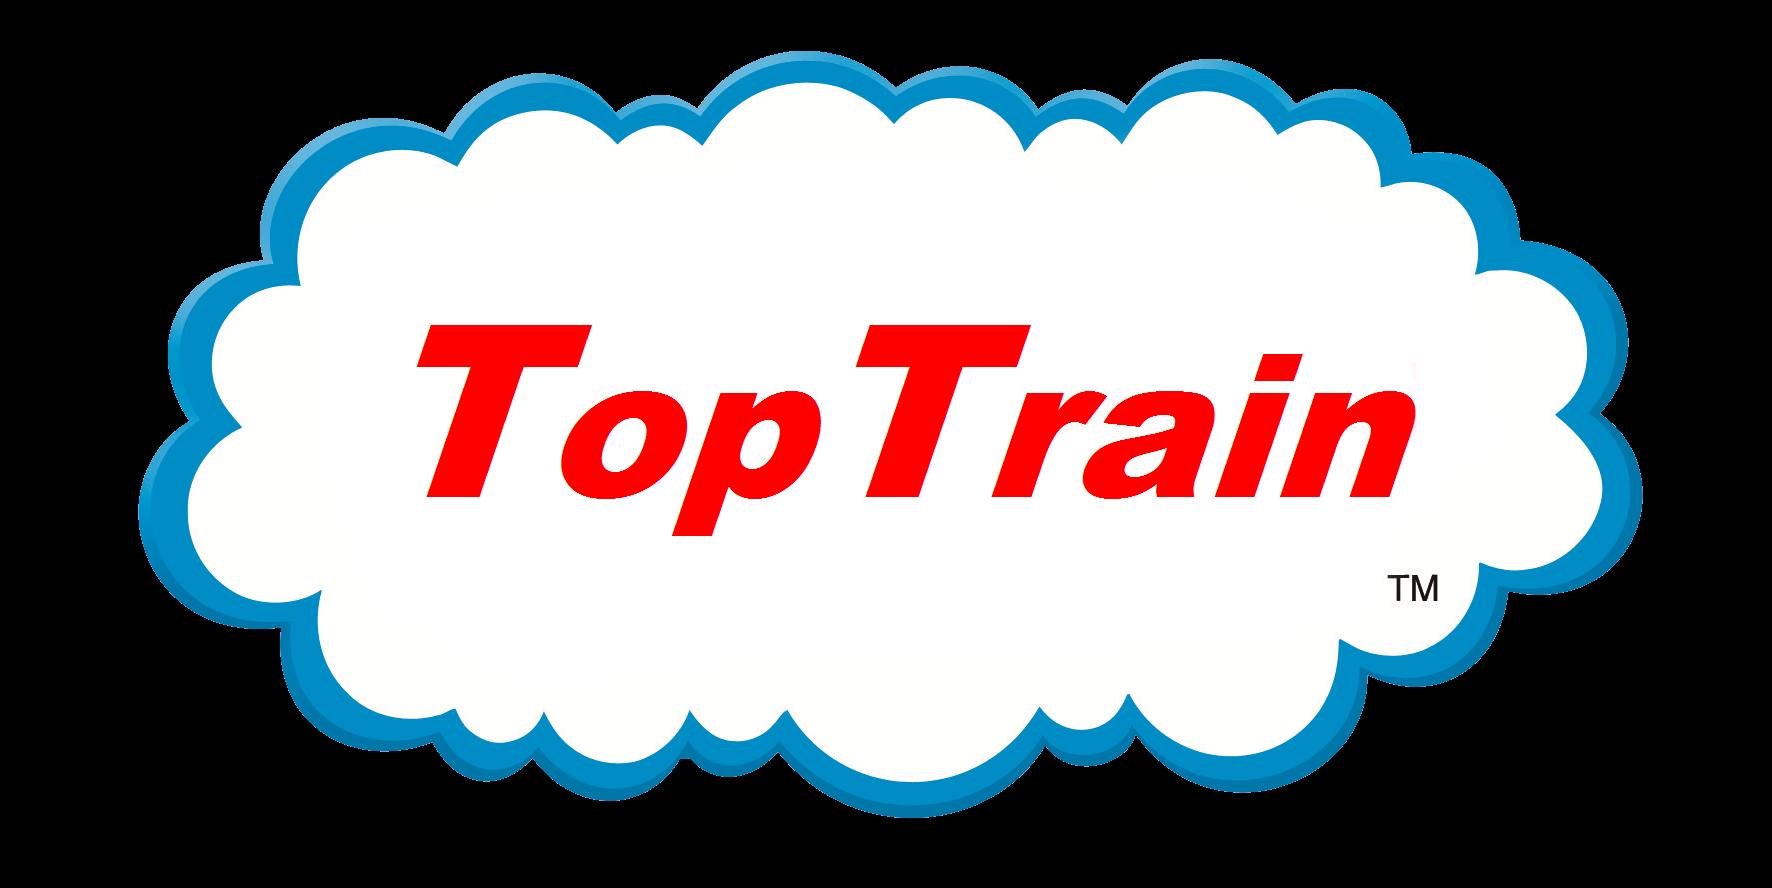 Top Train (Thomas/Top Gear Parody)